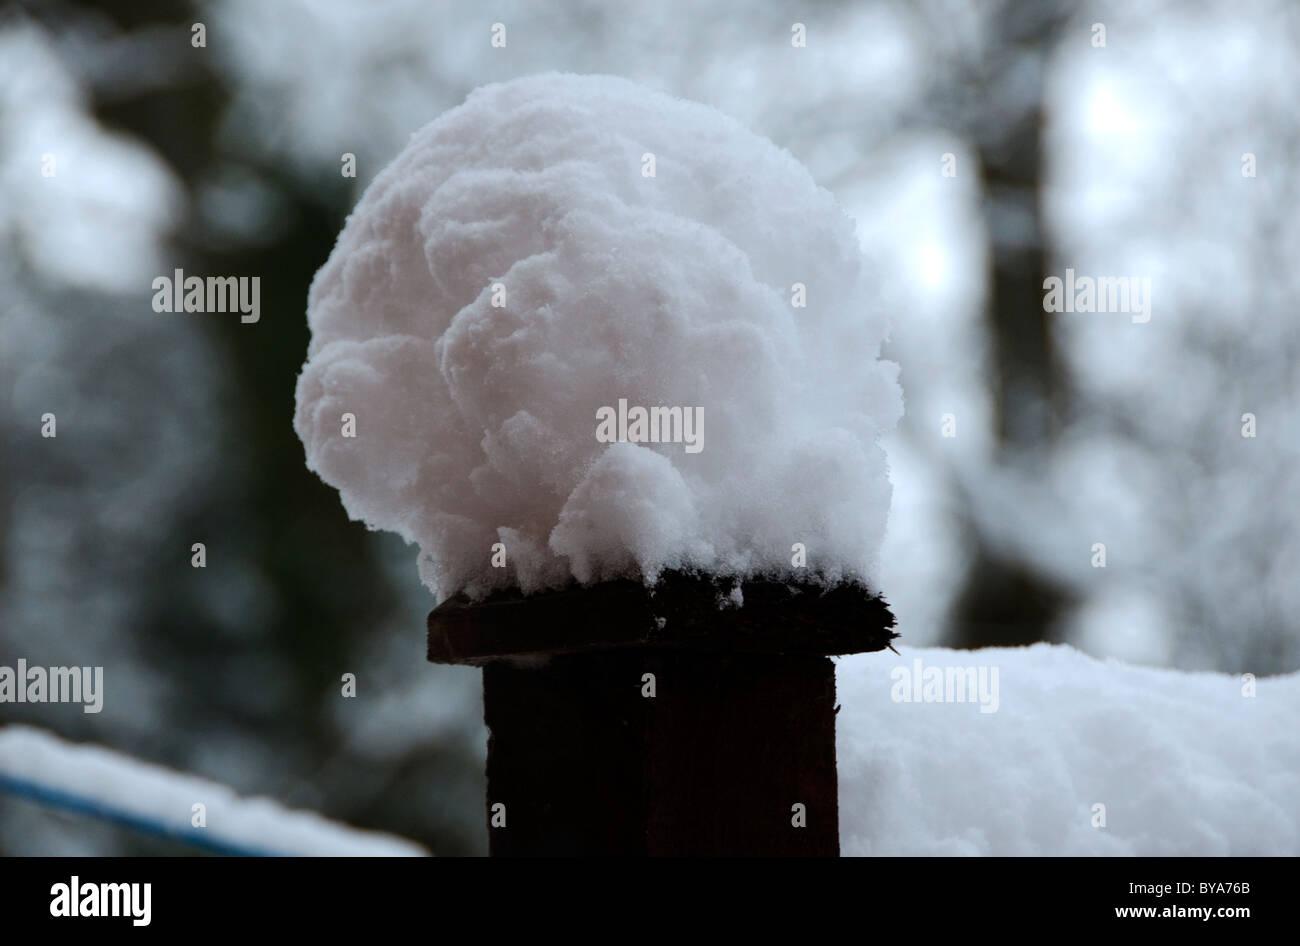 Snow on Garden fencepost, January 2010 - Stock Image